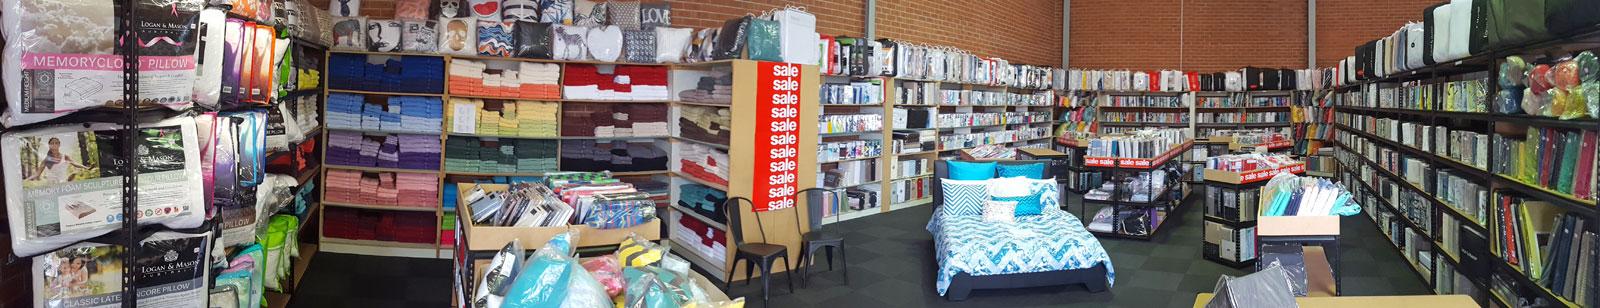 shop-pana.jpg